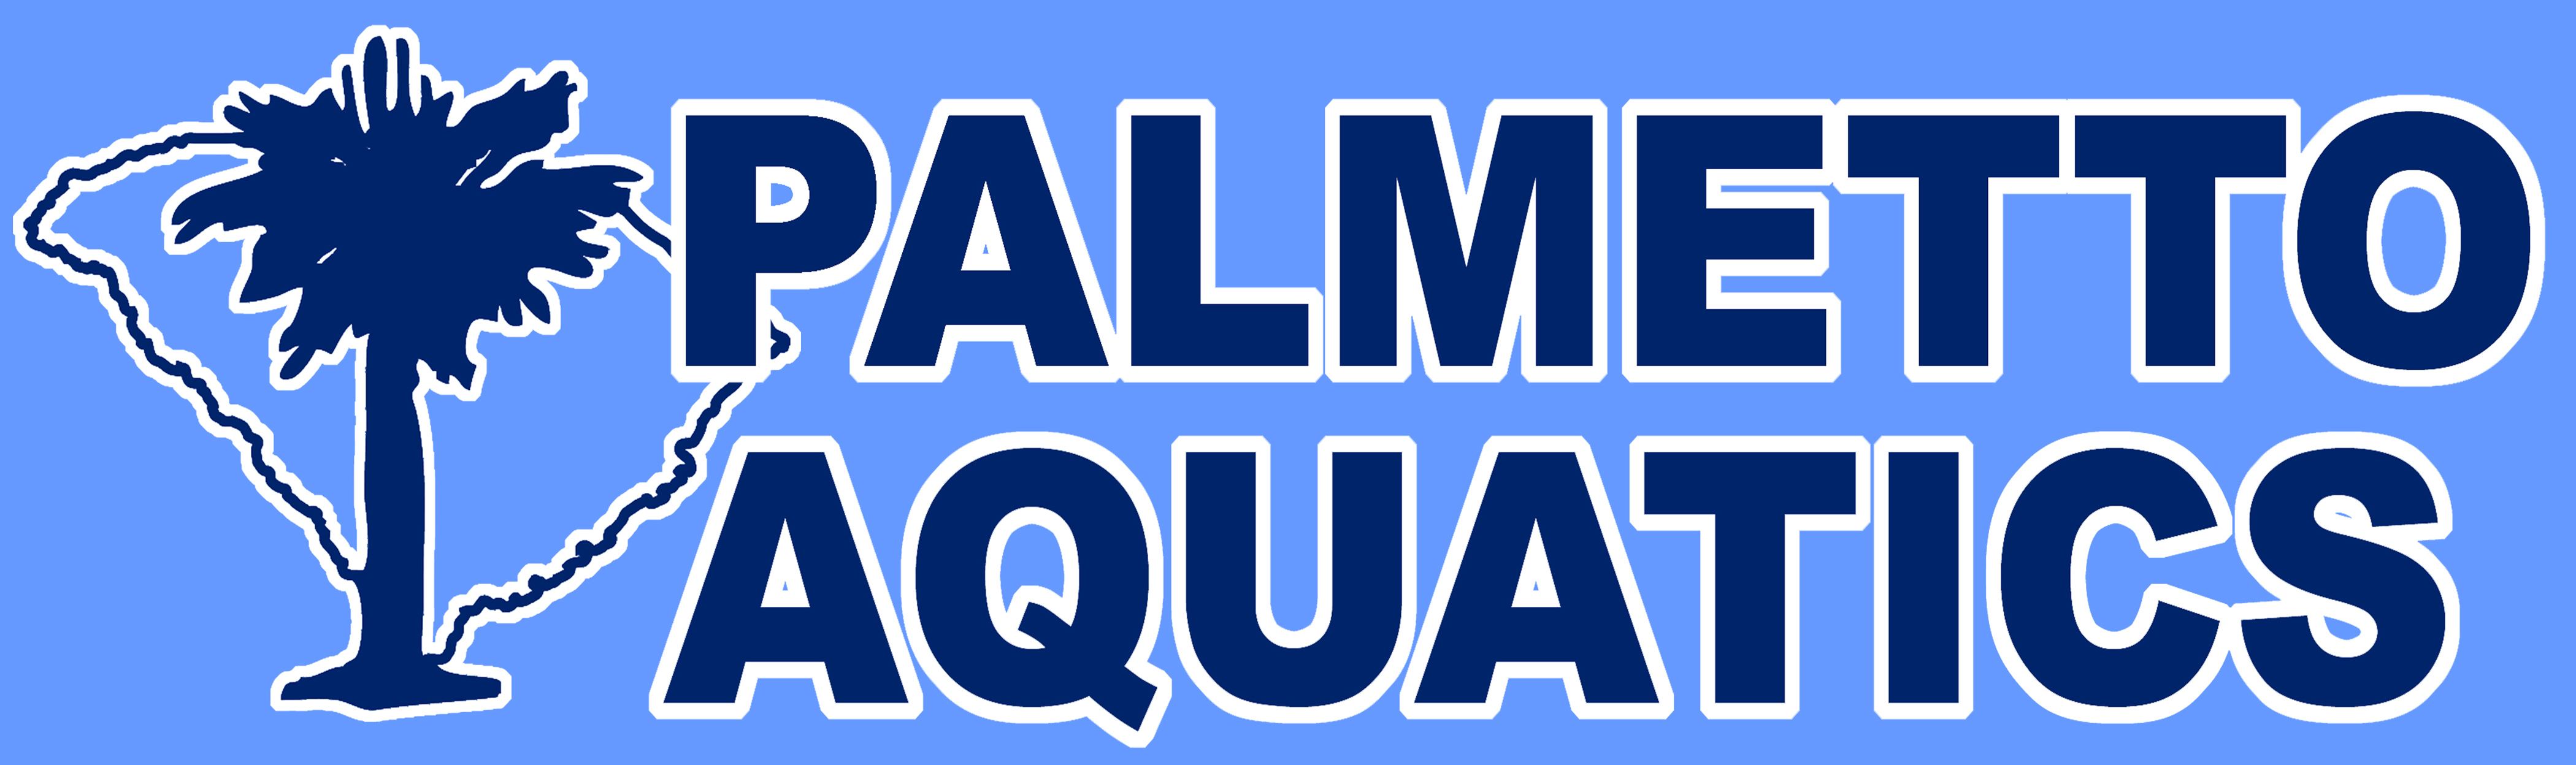 Palmetto Aquatics